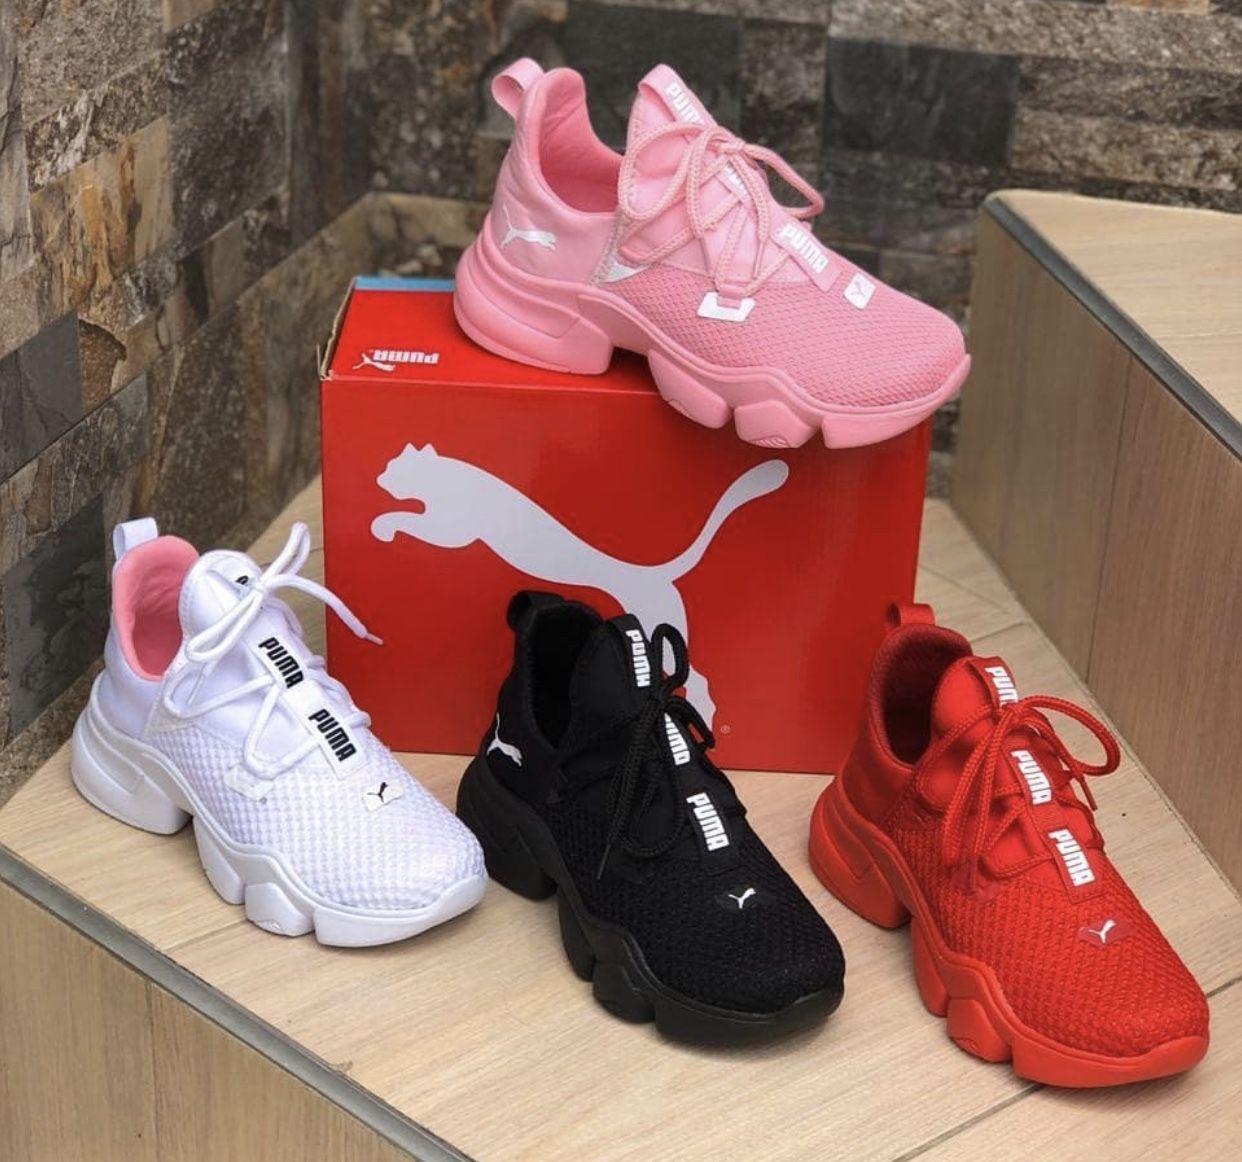 Pink/Black/White/Red Pumas   Red puma